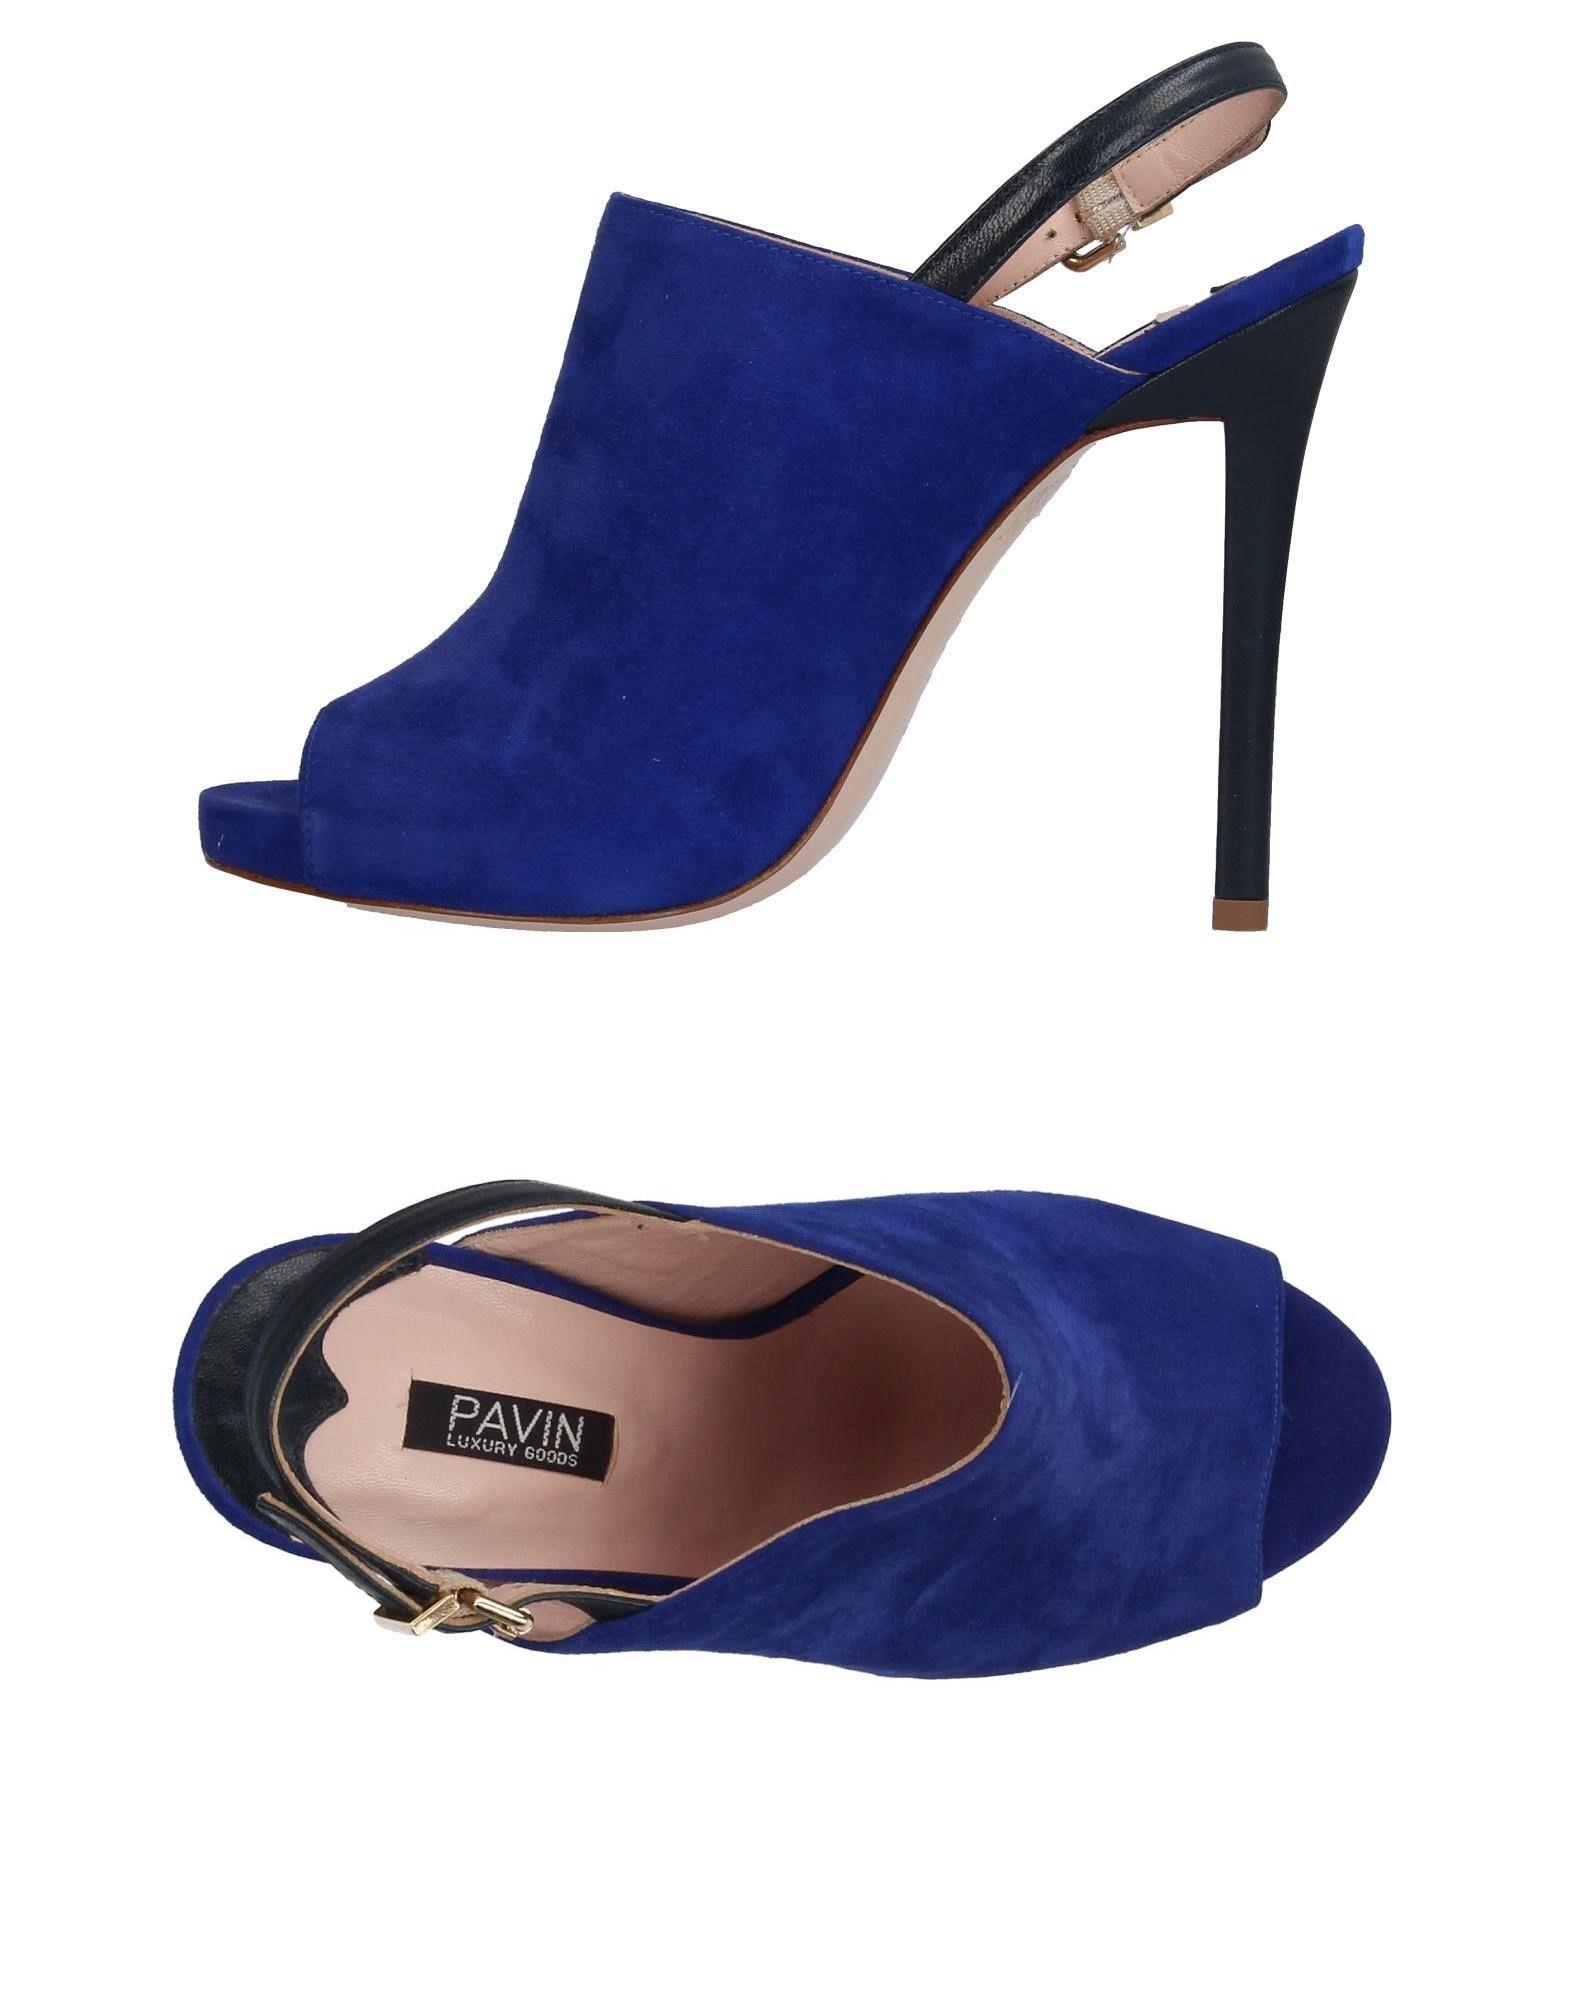 Moda Sandali Pavin Donna Donna Pavin - 11365526JV 67483f